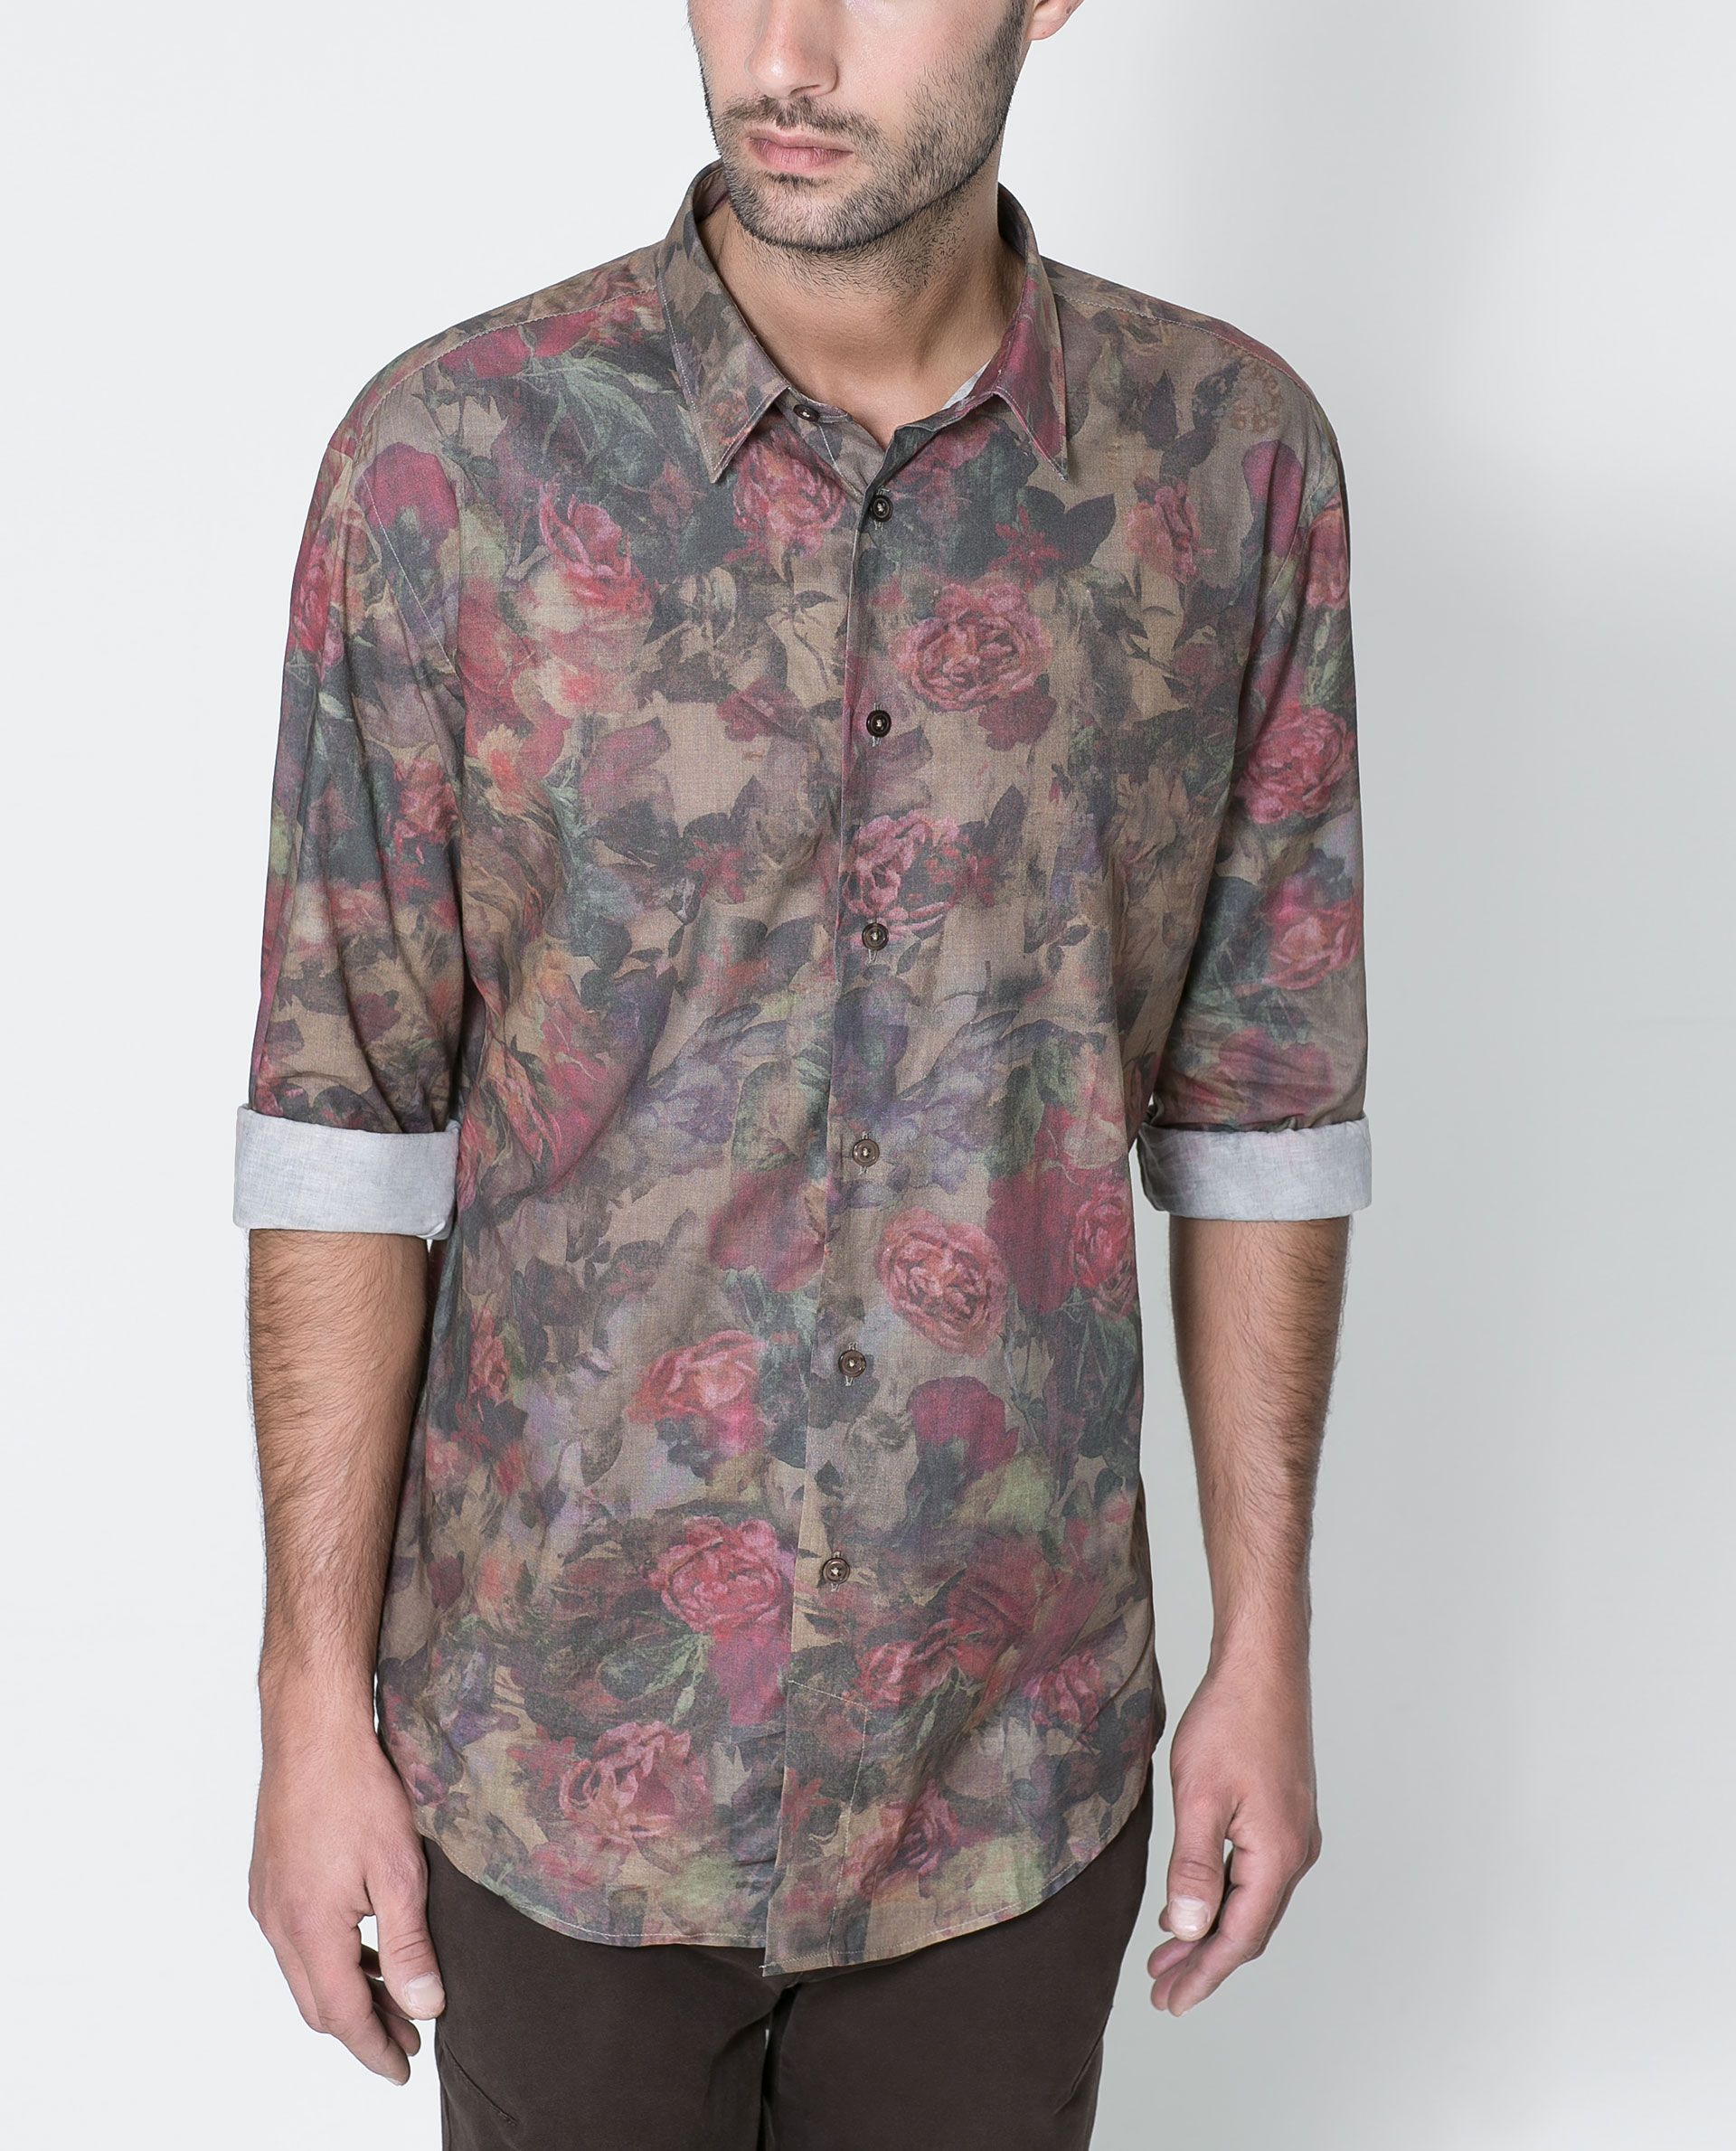 Flower shirt zara france menswear pinterest for Zara mens floral shirt